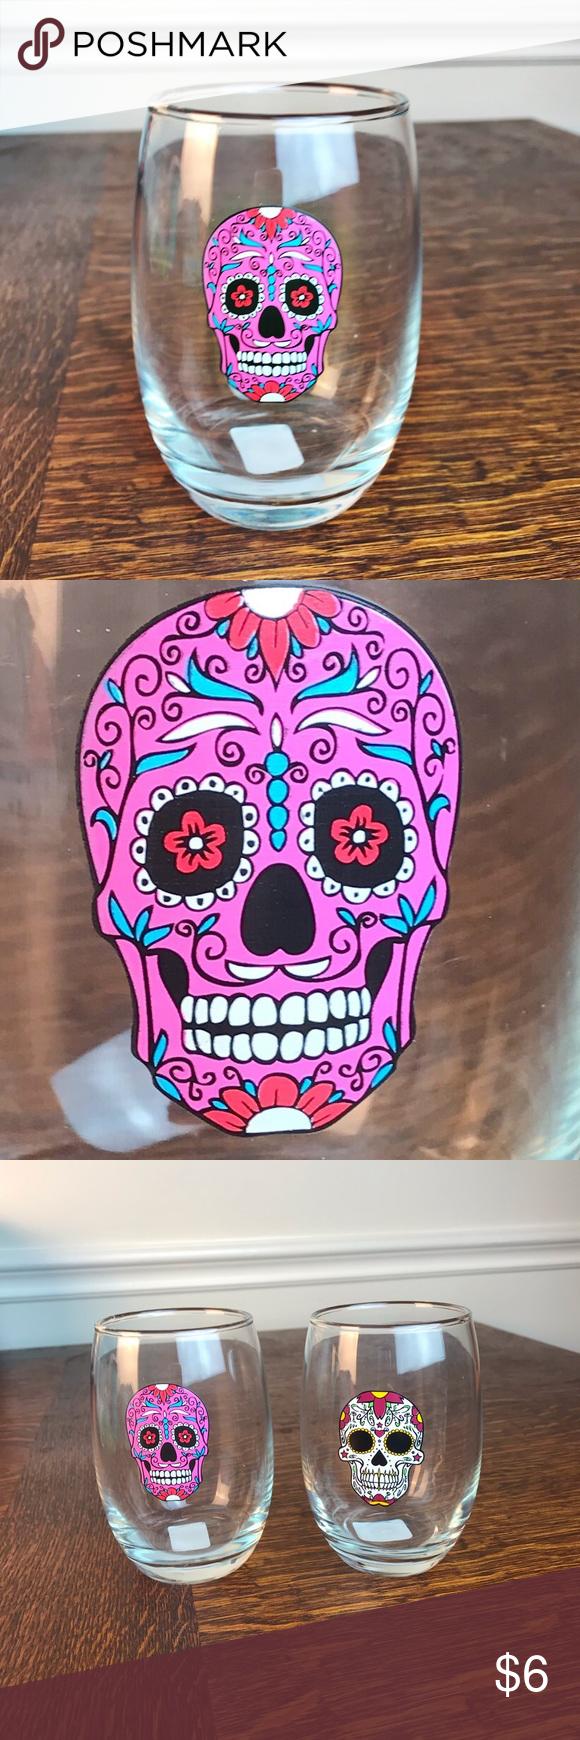 Sugar skull stemless wine glass purple skull Day of the